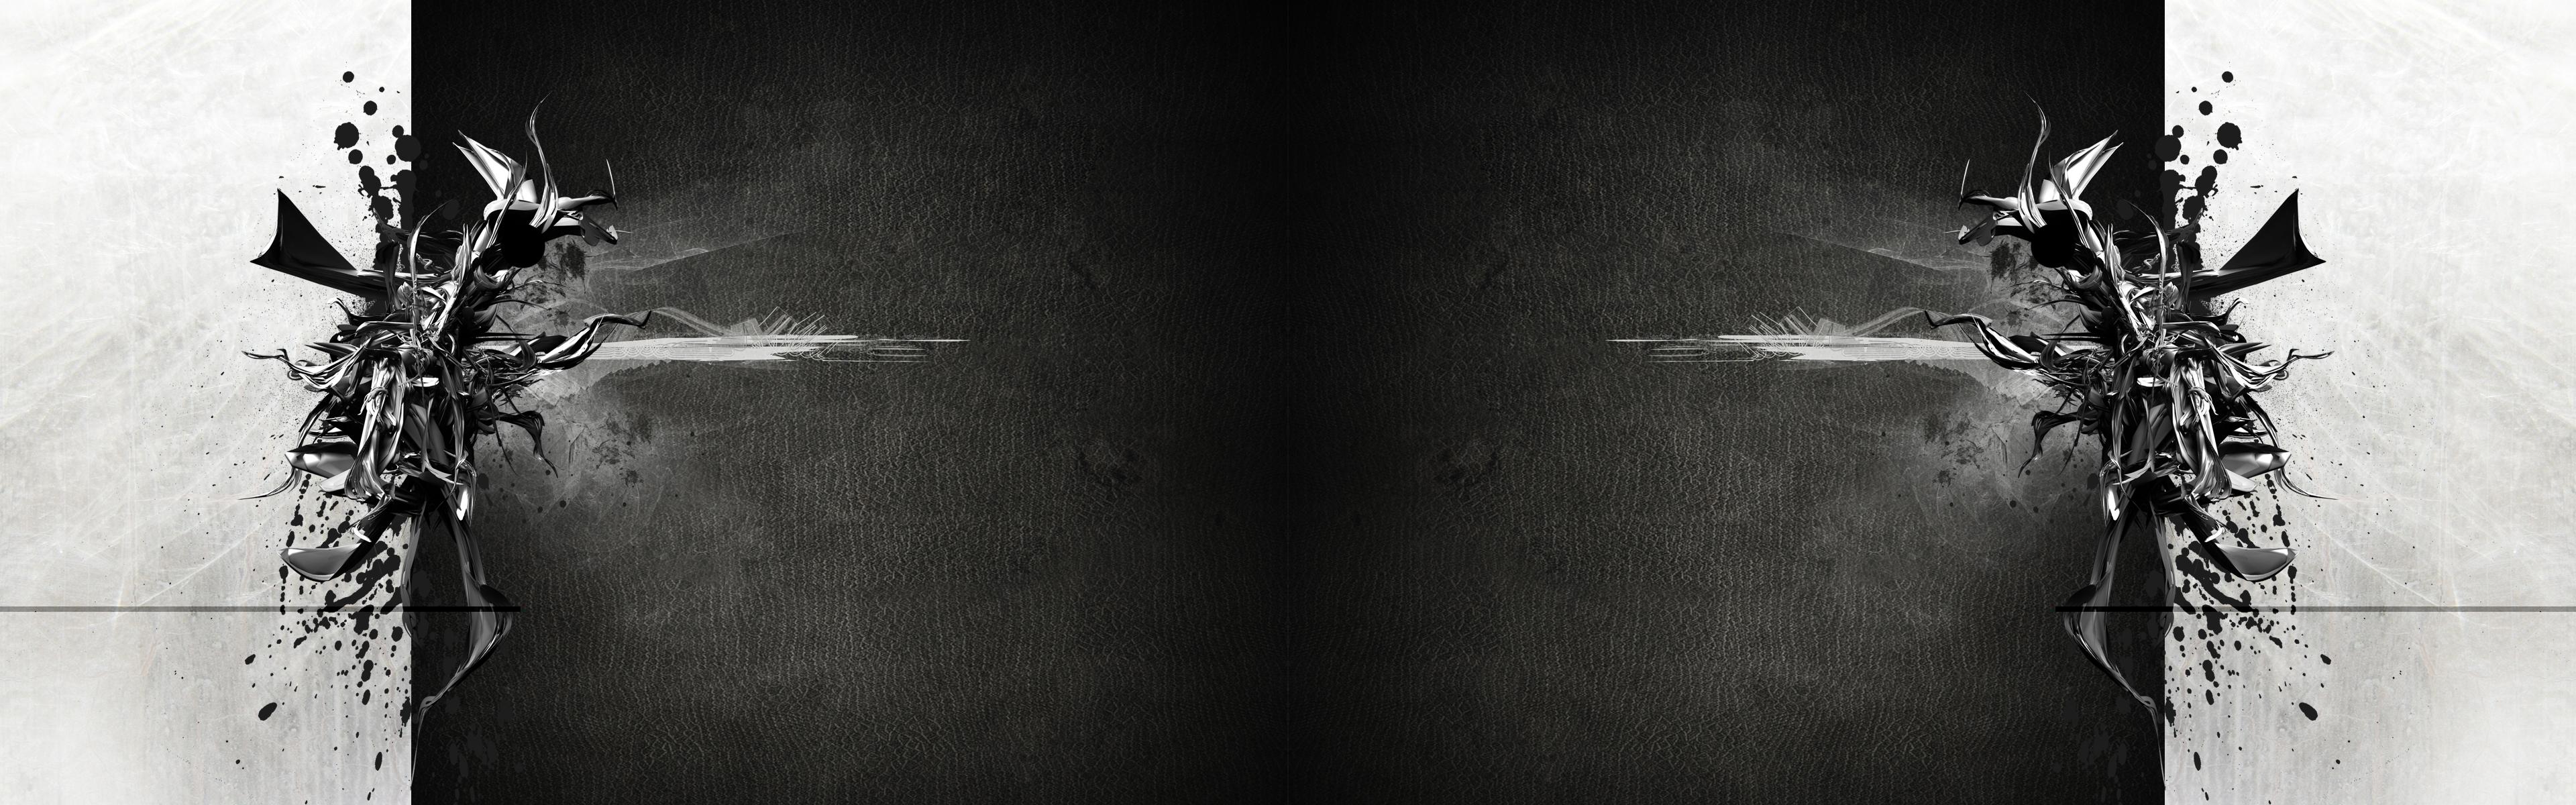 [43+] HD Dual Monitor Wallpapers 1080p on WallpaperSafari